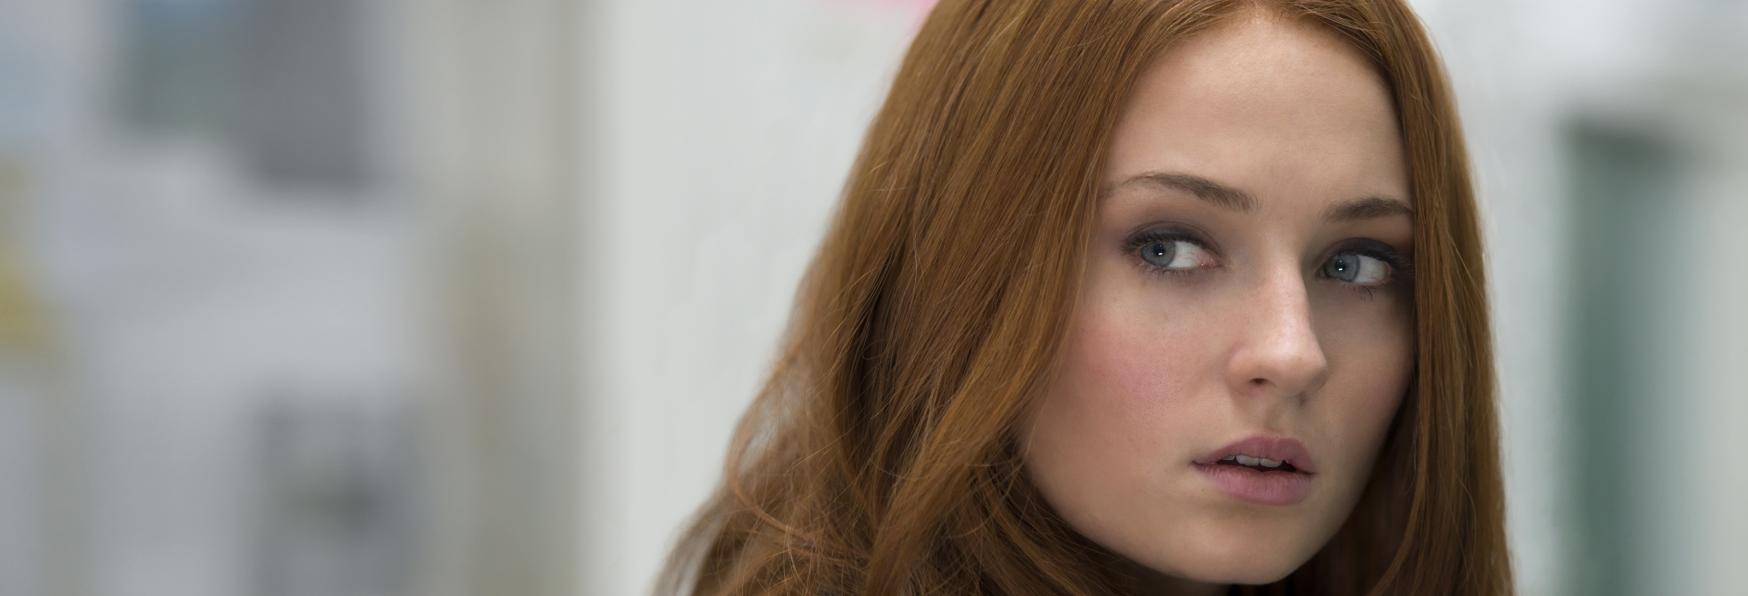 The Staircase: Sophie Turner (Game of Thrones) nel Cast della Serie TV targata HBO Max